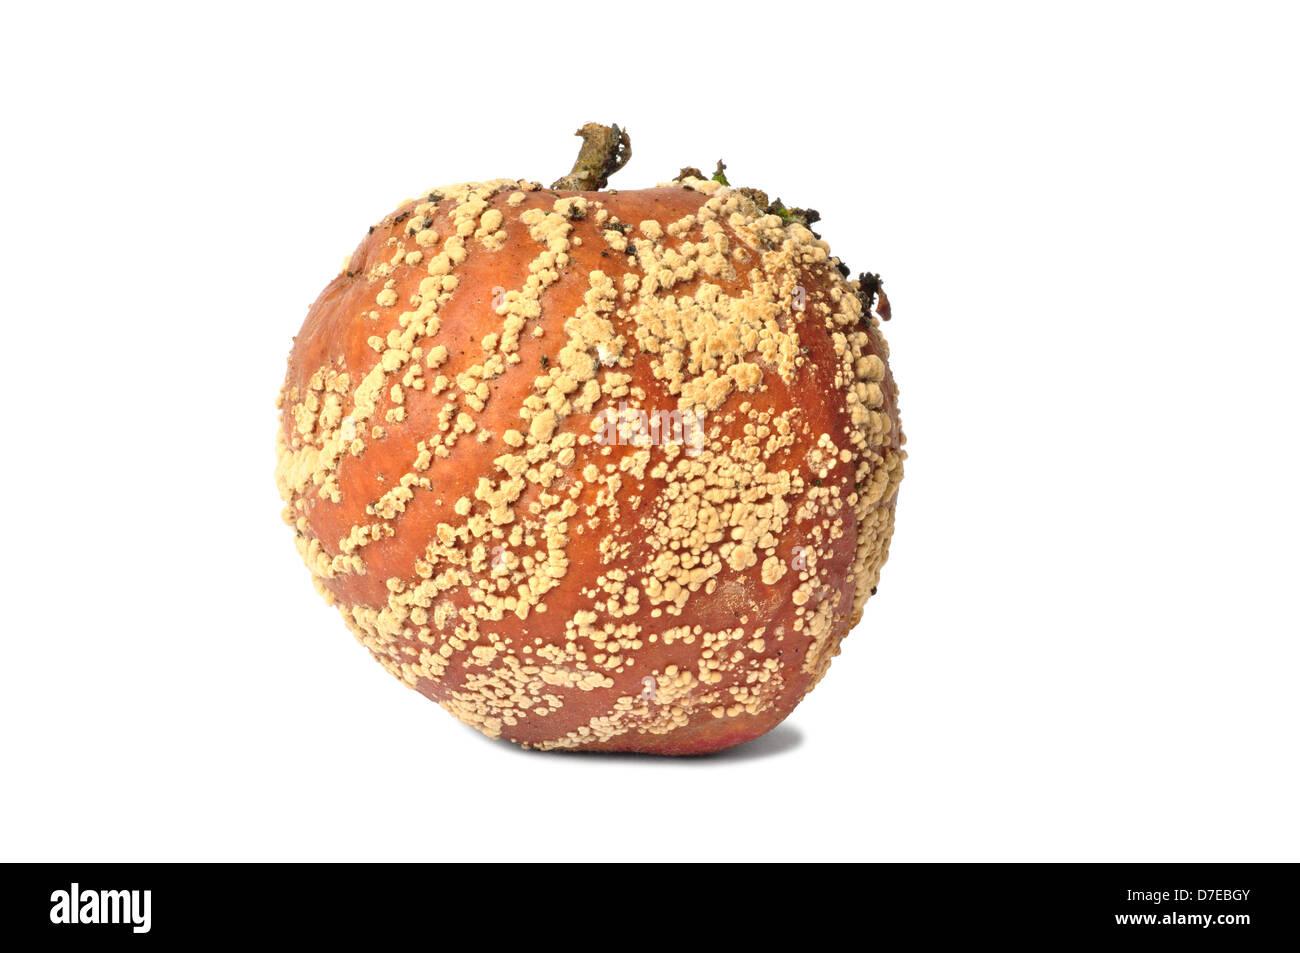 Rotten Apple On White Background - Stock Image